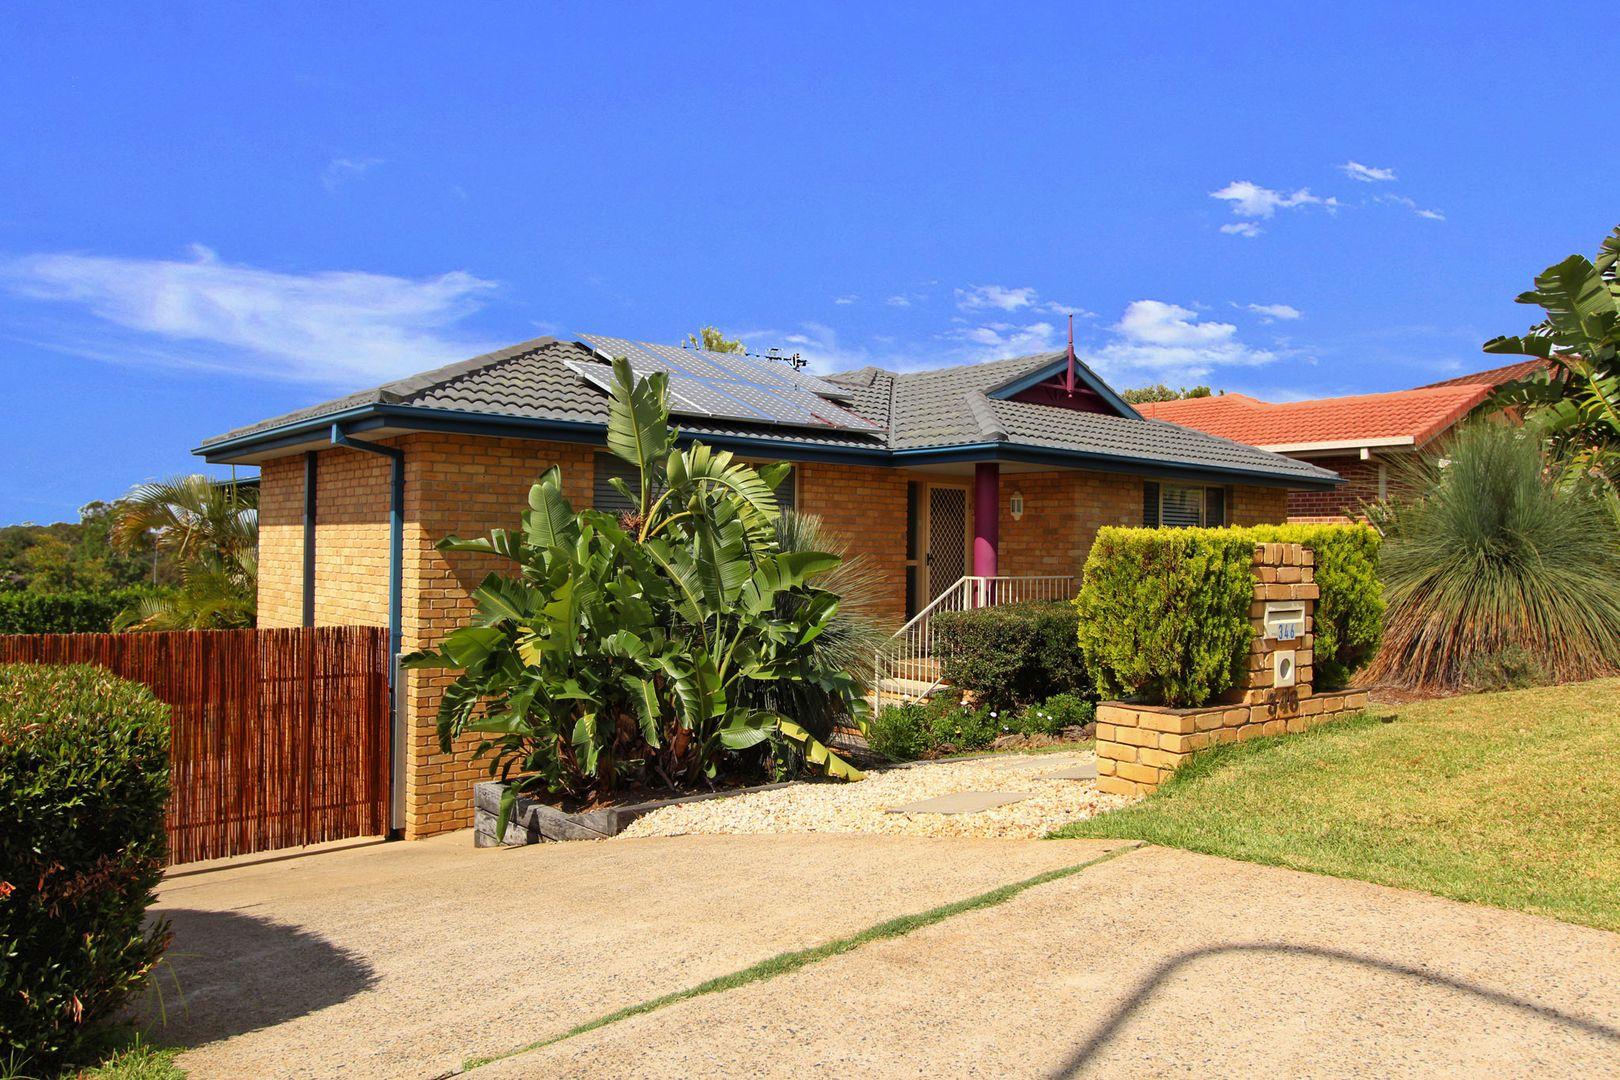 346 Crestwood Dr, Port Macquarie NSW 2444, Image 0